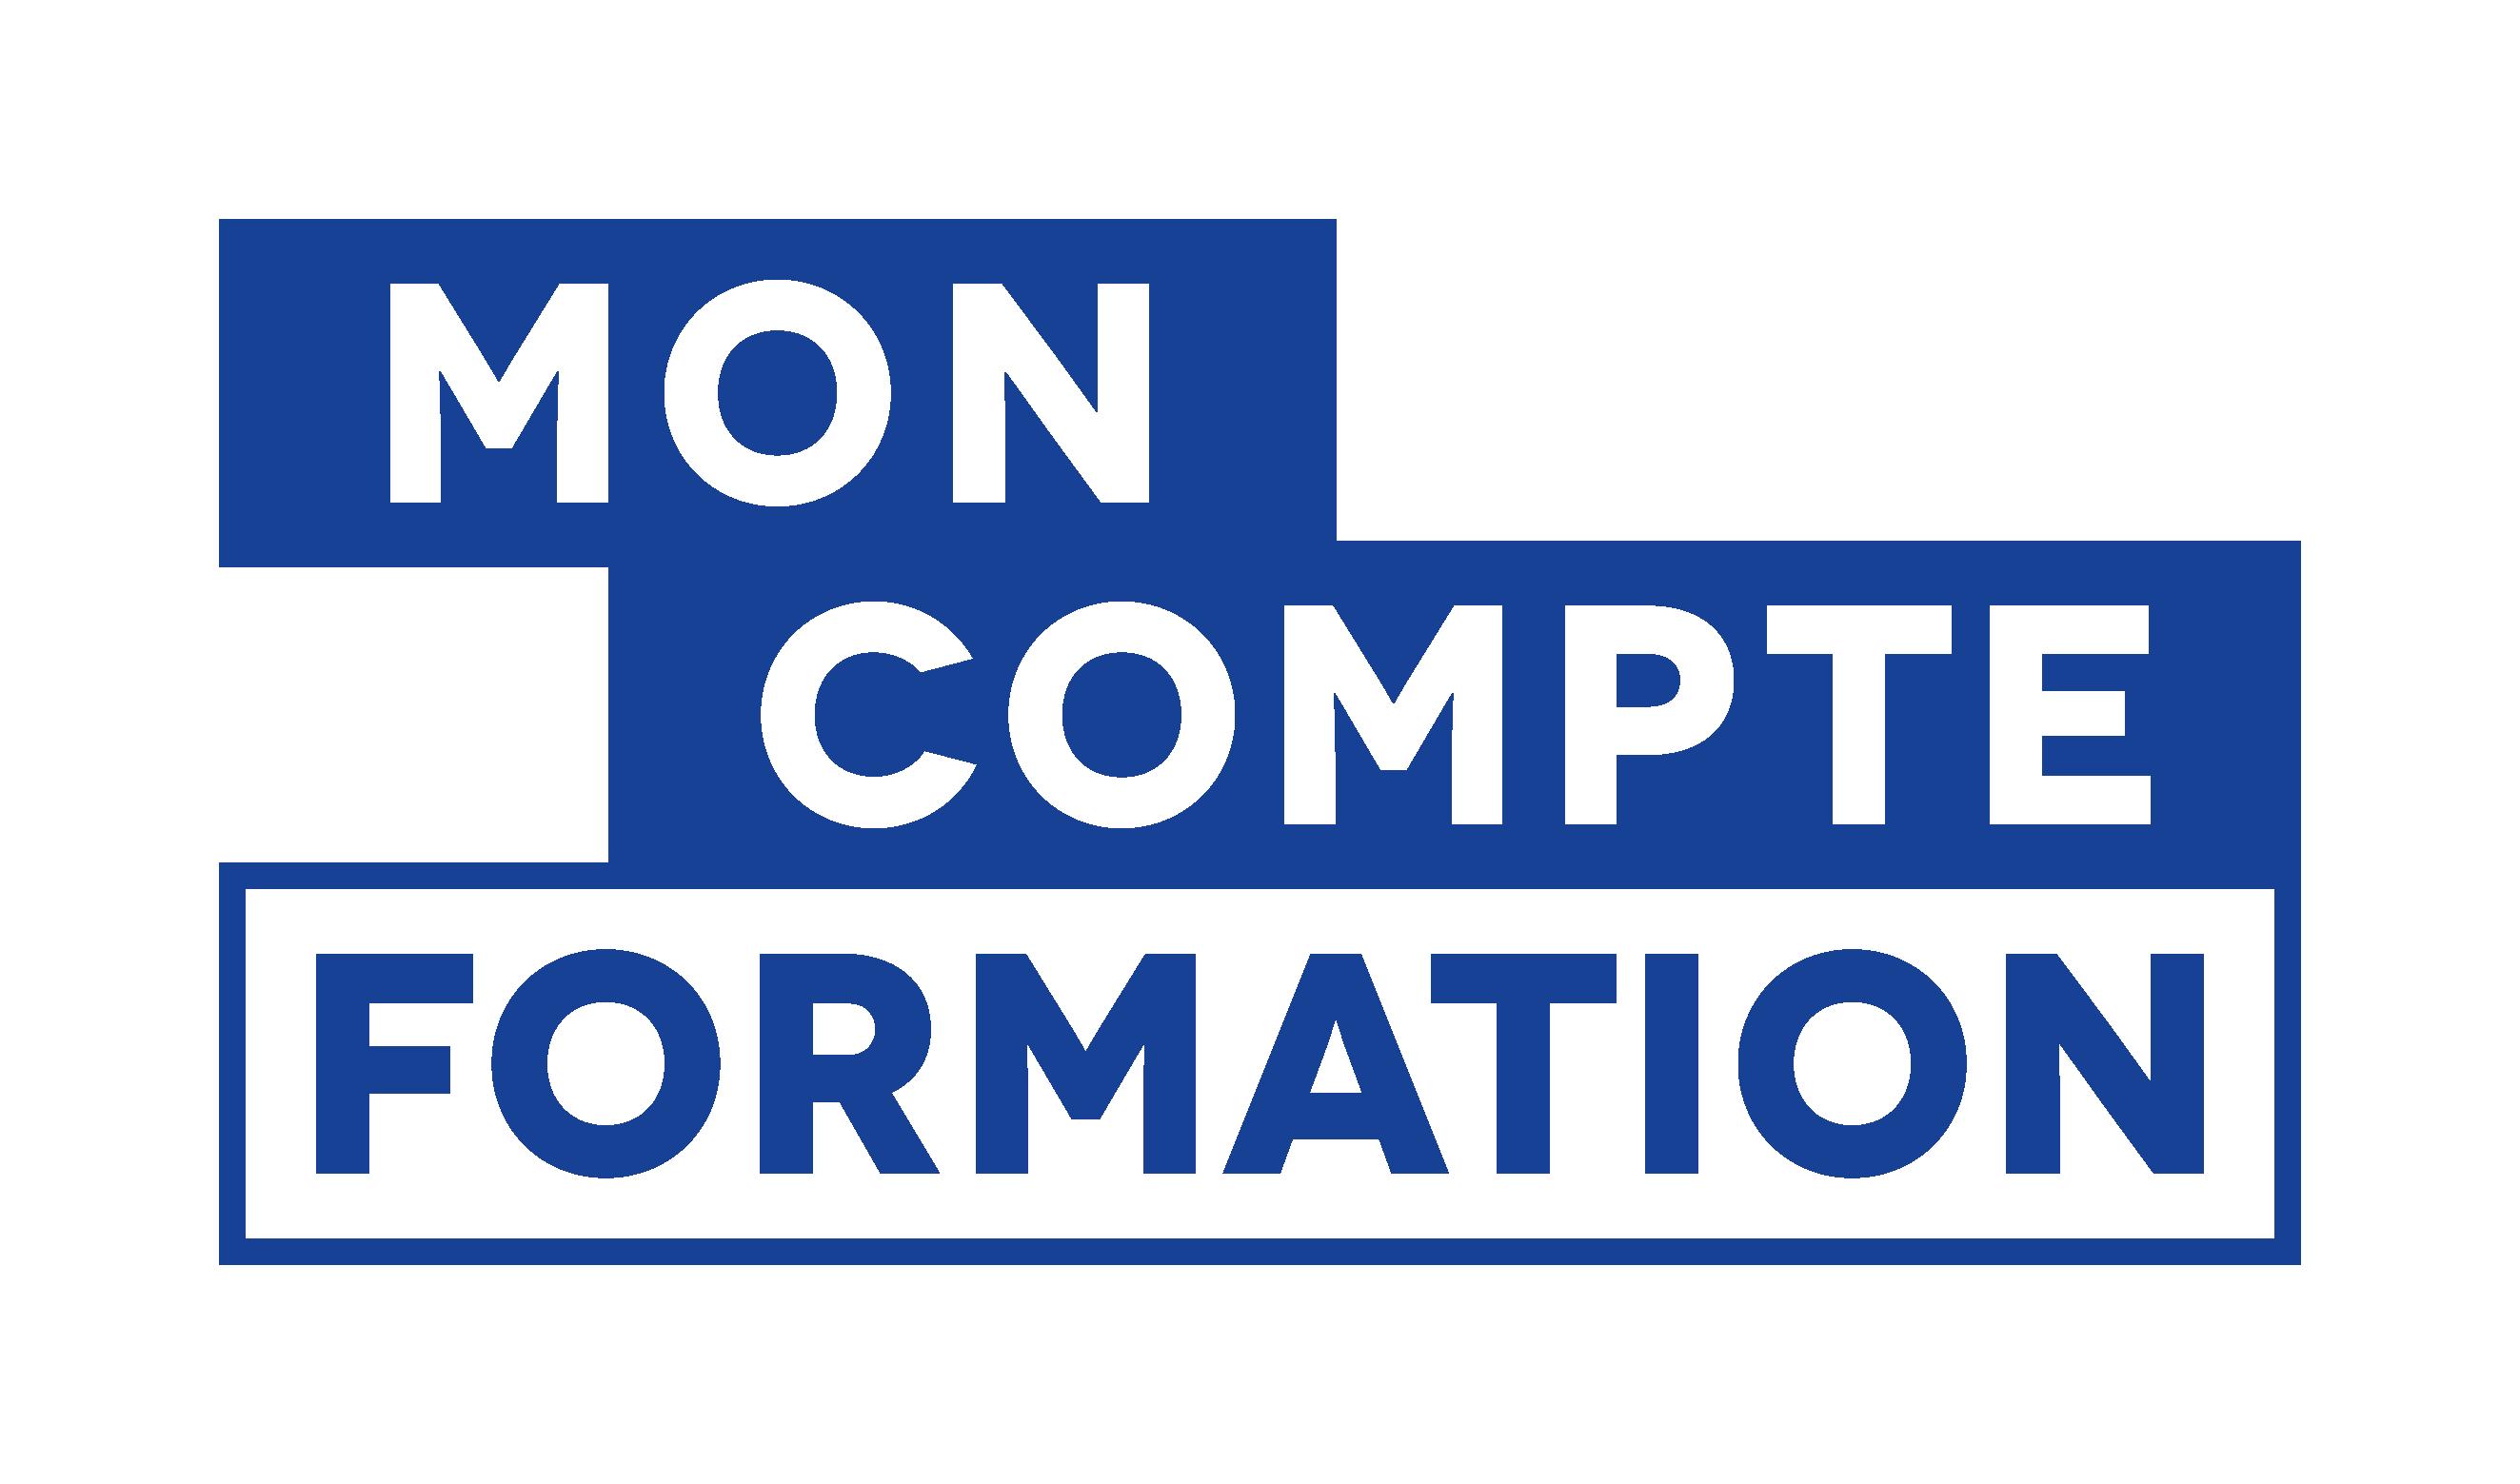 Logo mon compte formation orthographiq